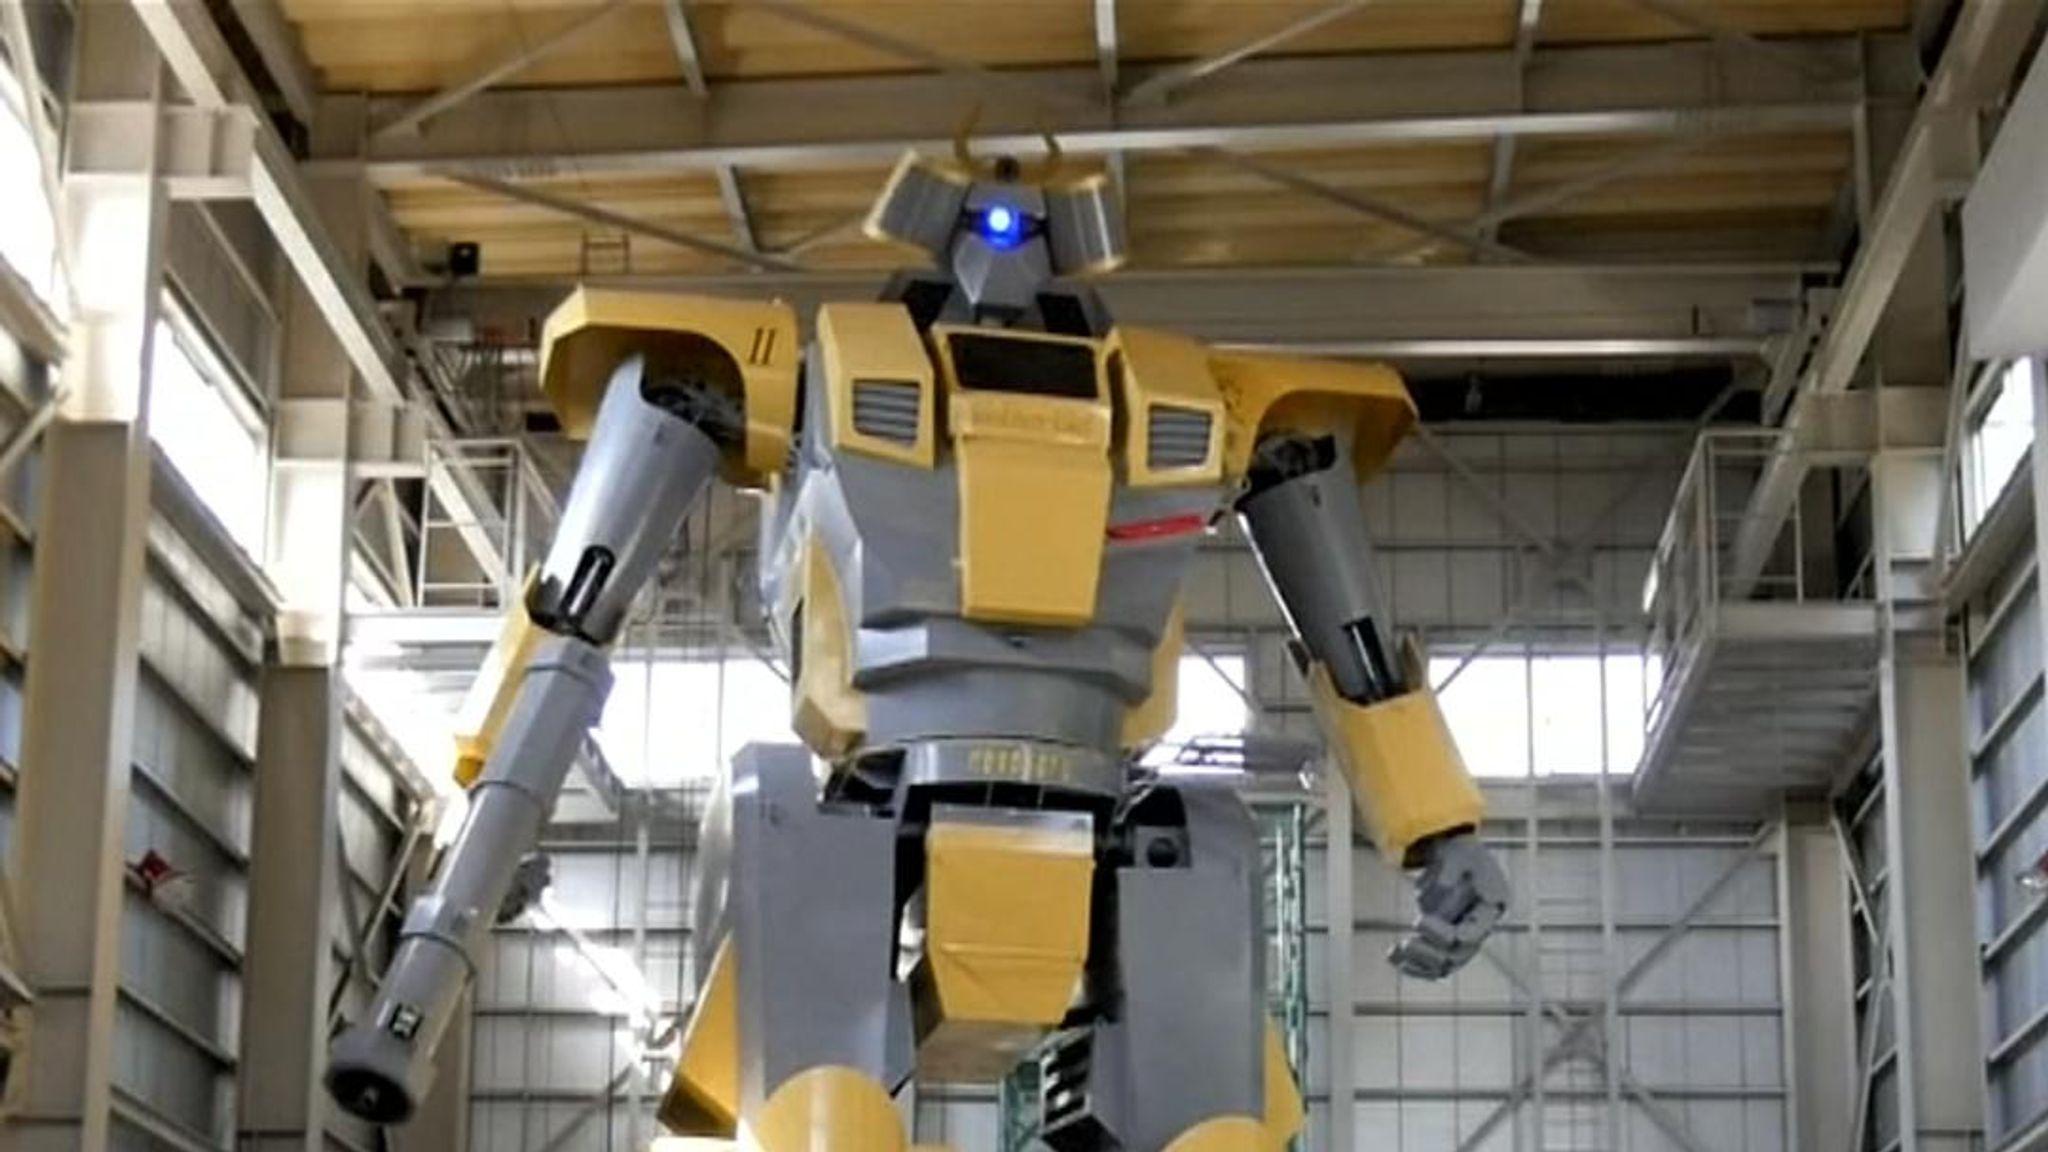 Japanese engineer Masaaki Nagumo has built a giant rideable 'Gundam' robot